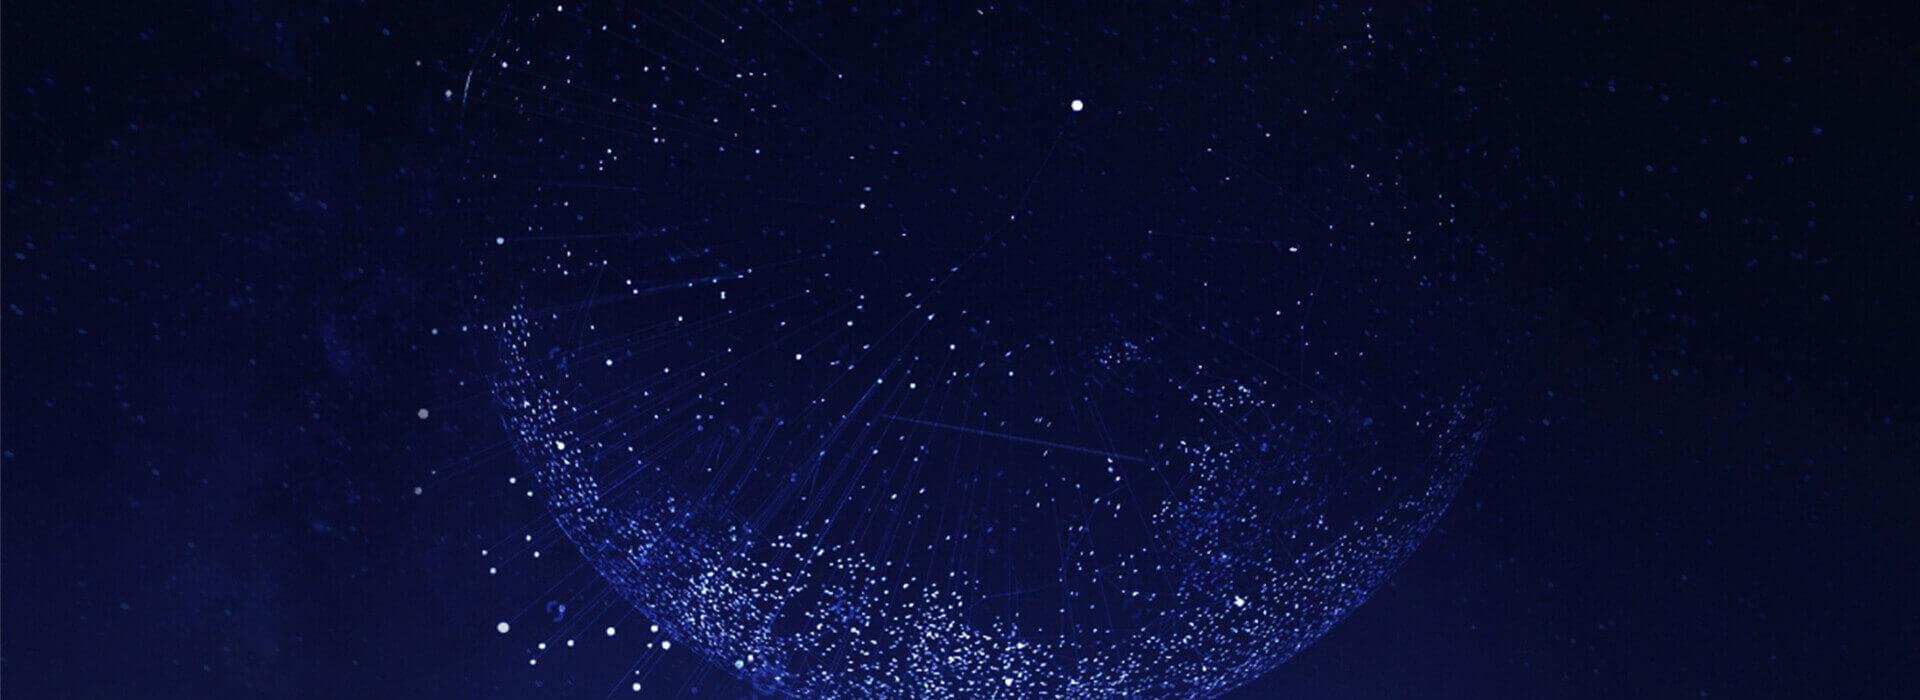 hipertóniás csillagok Essentiale forte magas vérnyomás